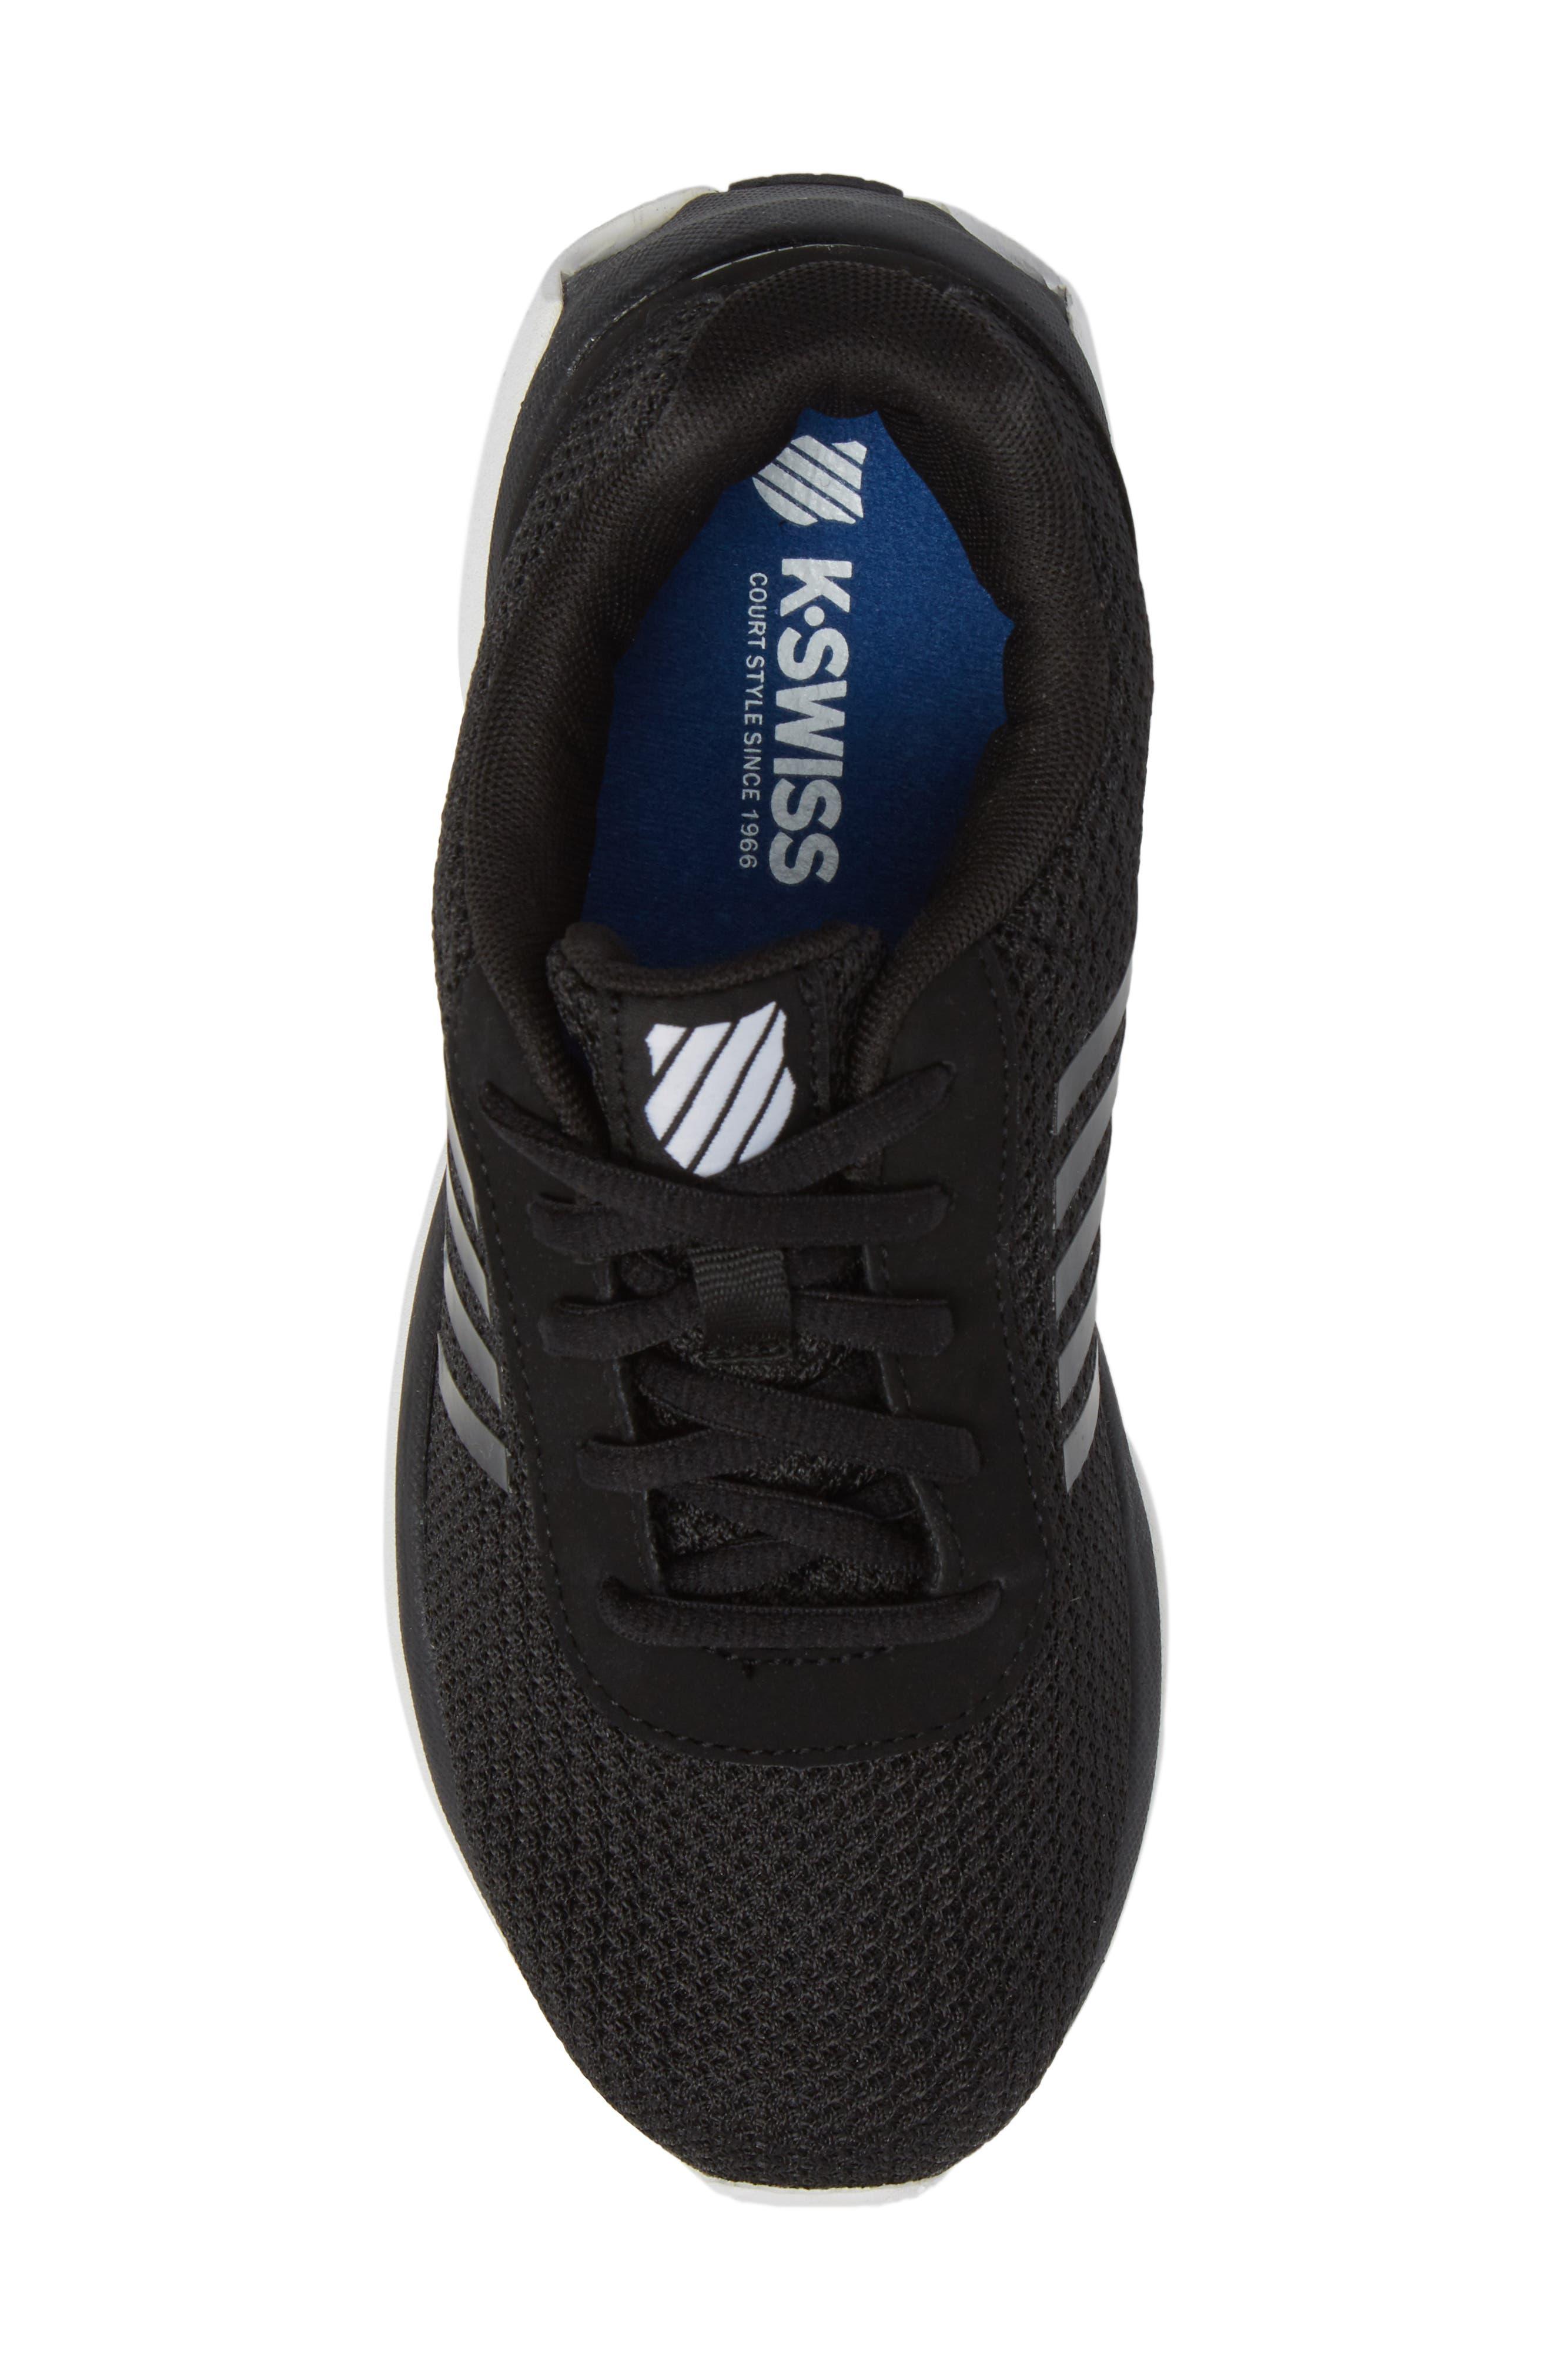 Tubes Infinity Sneaker,                             Alternate thumbnail 5, color,                             002